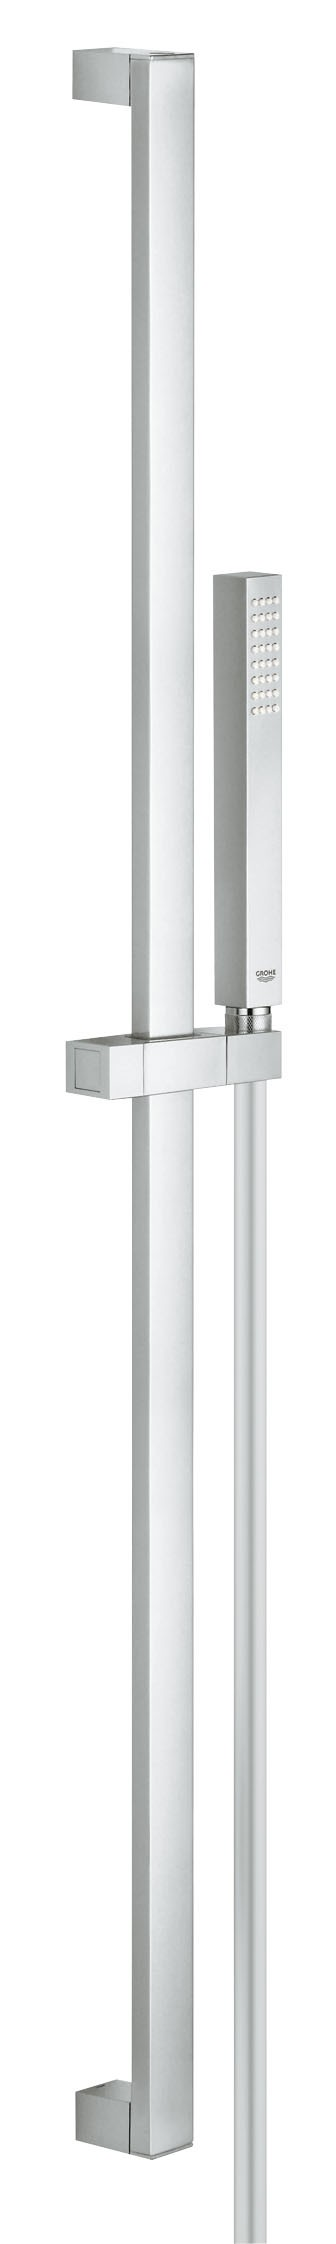 Grohe 27700000 Euphoria Cube (ручной душ, штанга 900 мм, шланг 1750 мм), хром